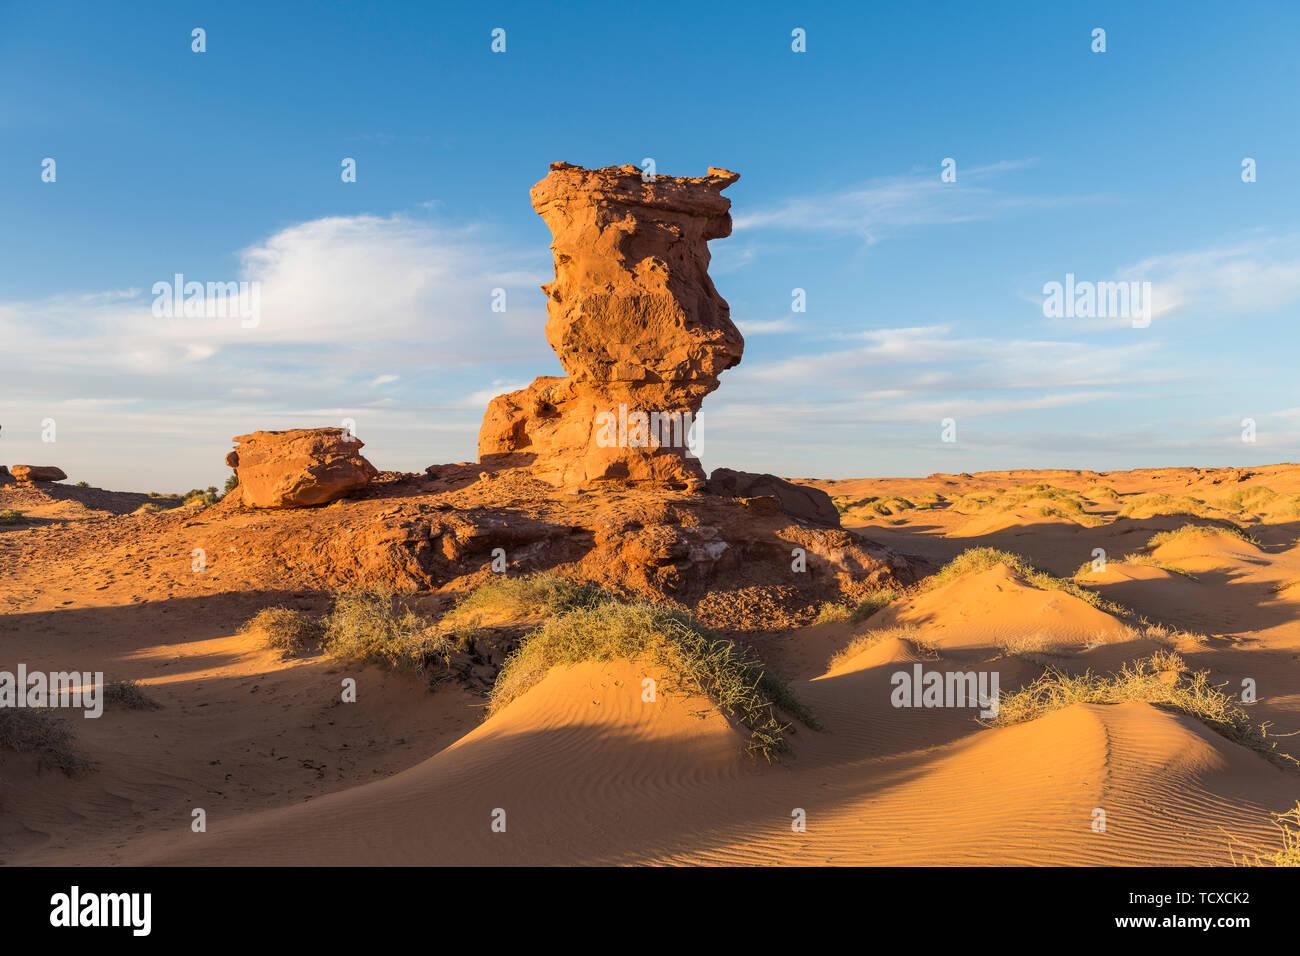 Sunset in the Sahara near Timimoun, western Algeria, North Africa, Africa - Stock Image